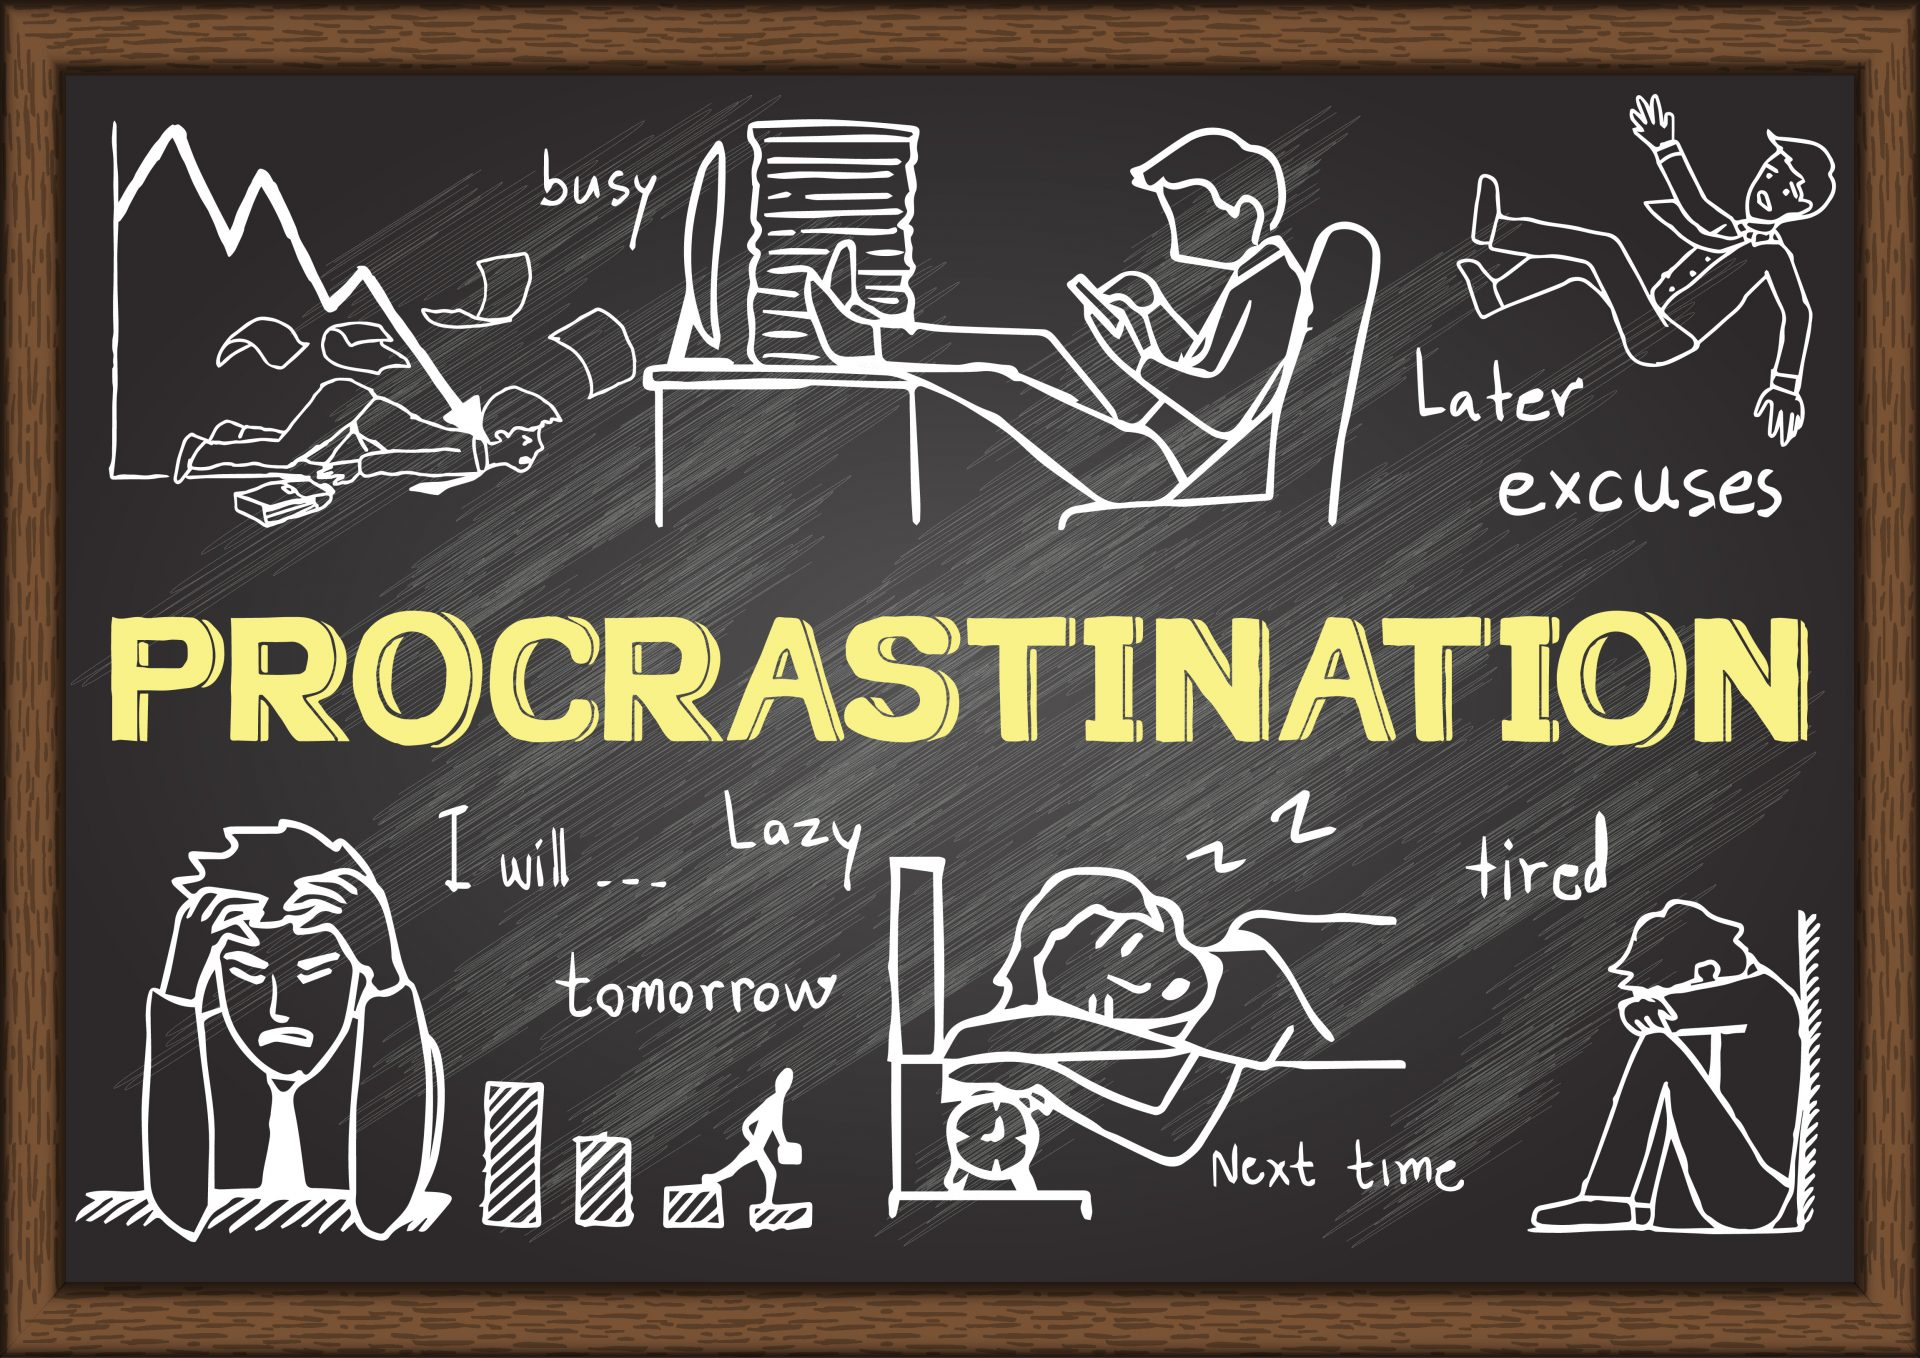 Procrastination_tips_ to_overcome_this_bad_habit